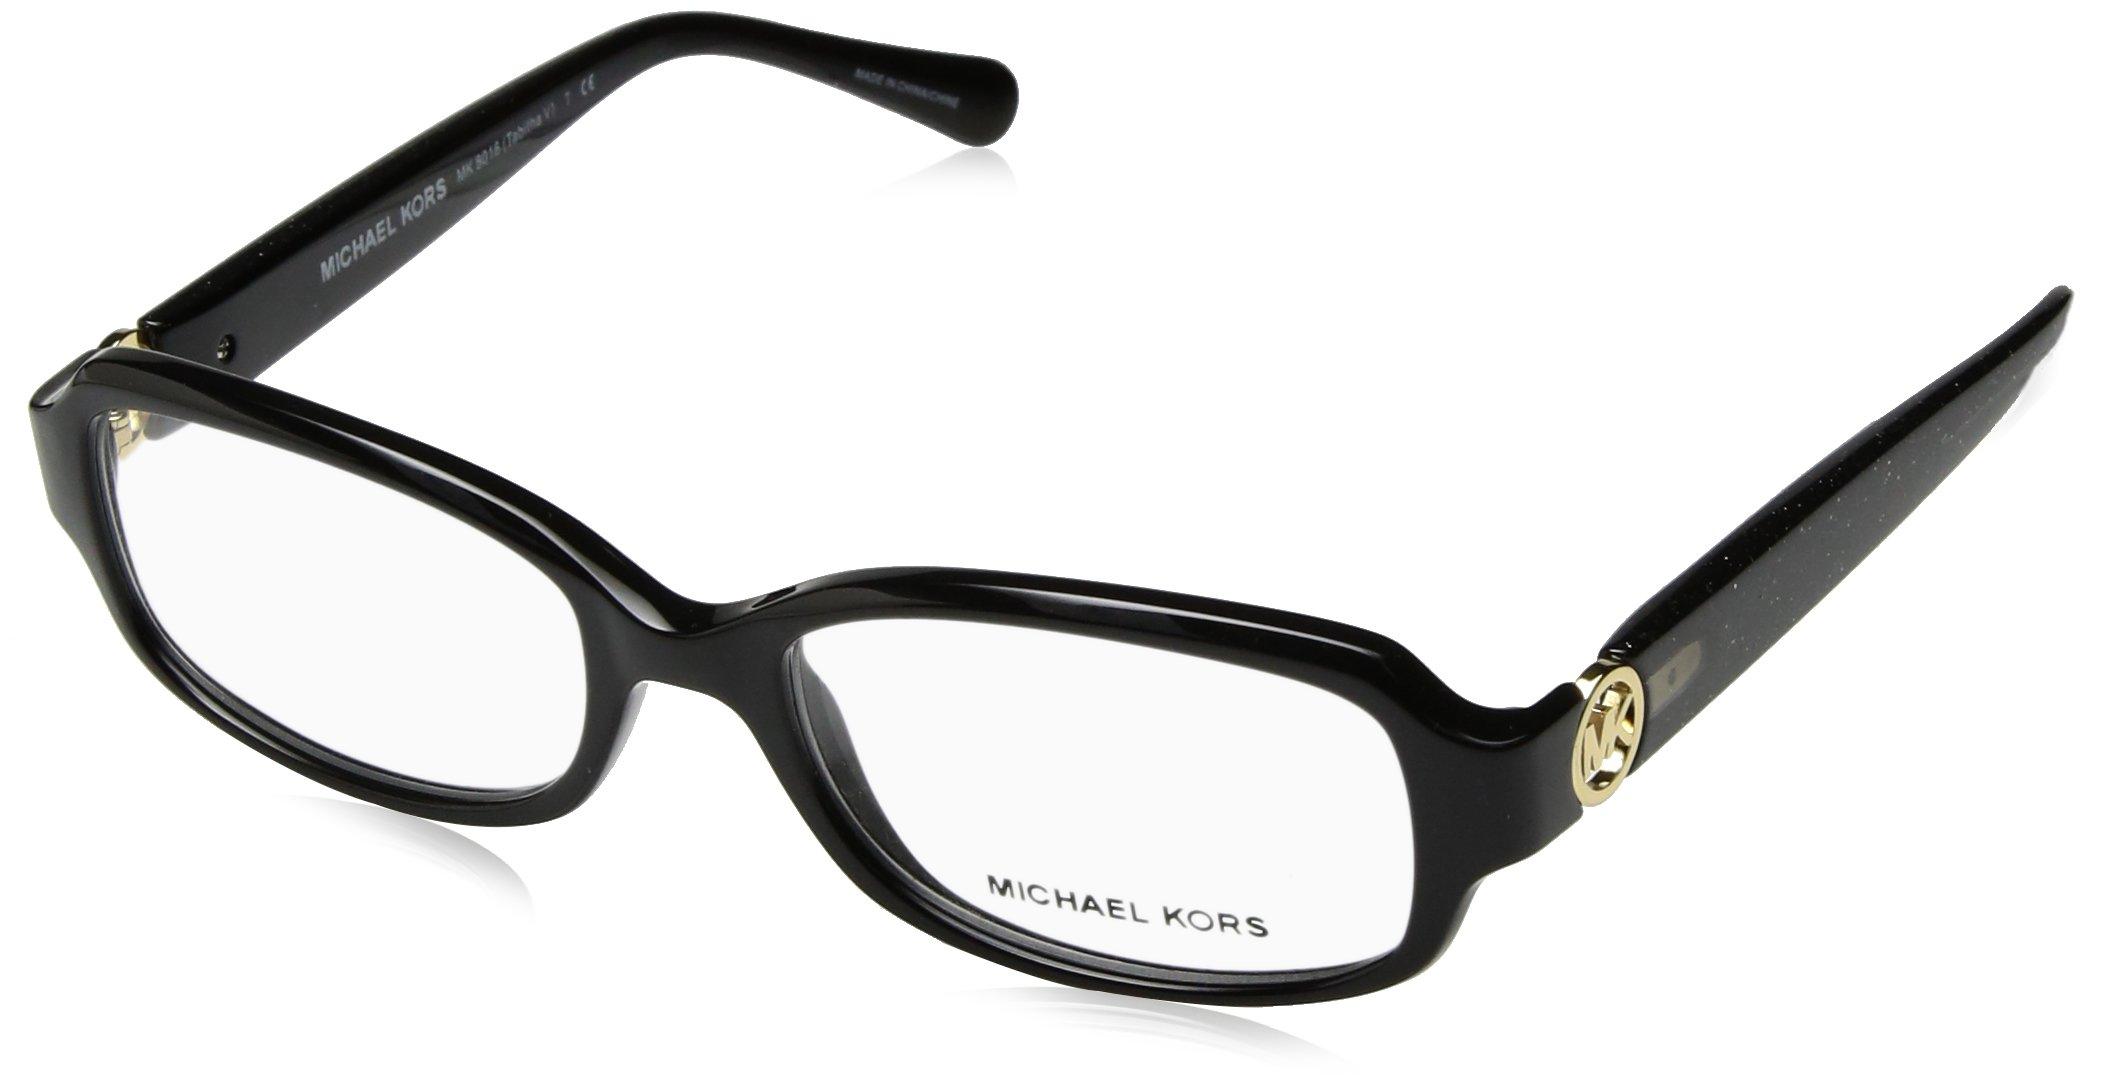 52929ff9cb Michael Kors 0MK8016 Optical Full Rim Rectangle Womens Sunglasses product  image